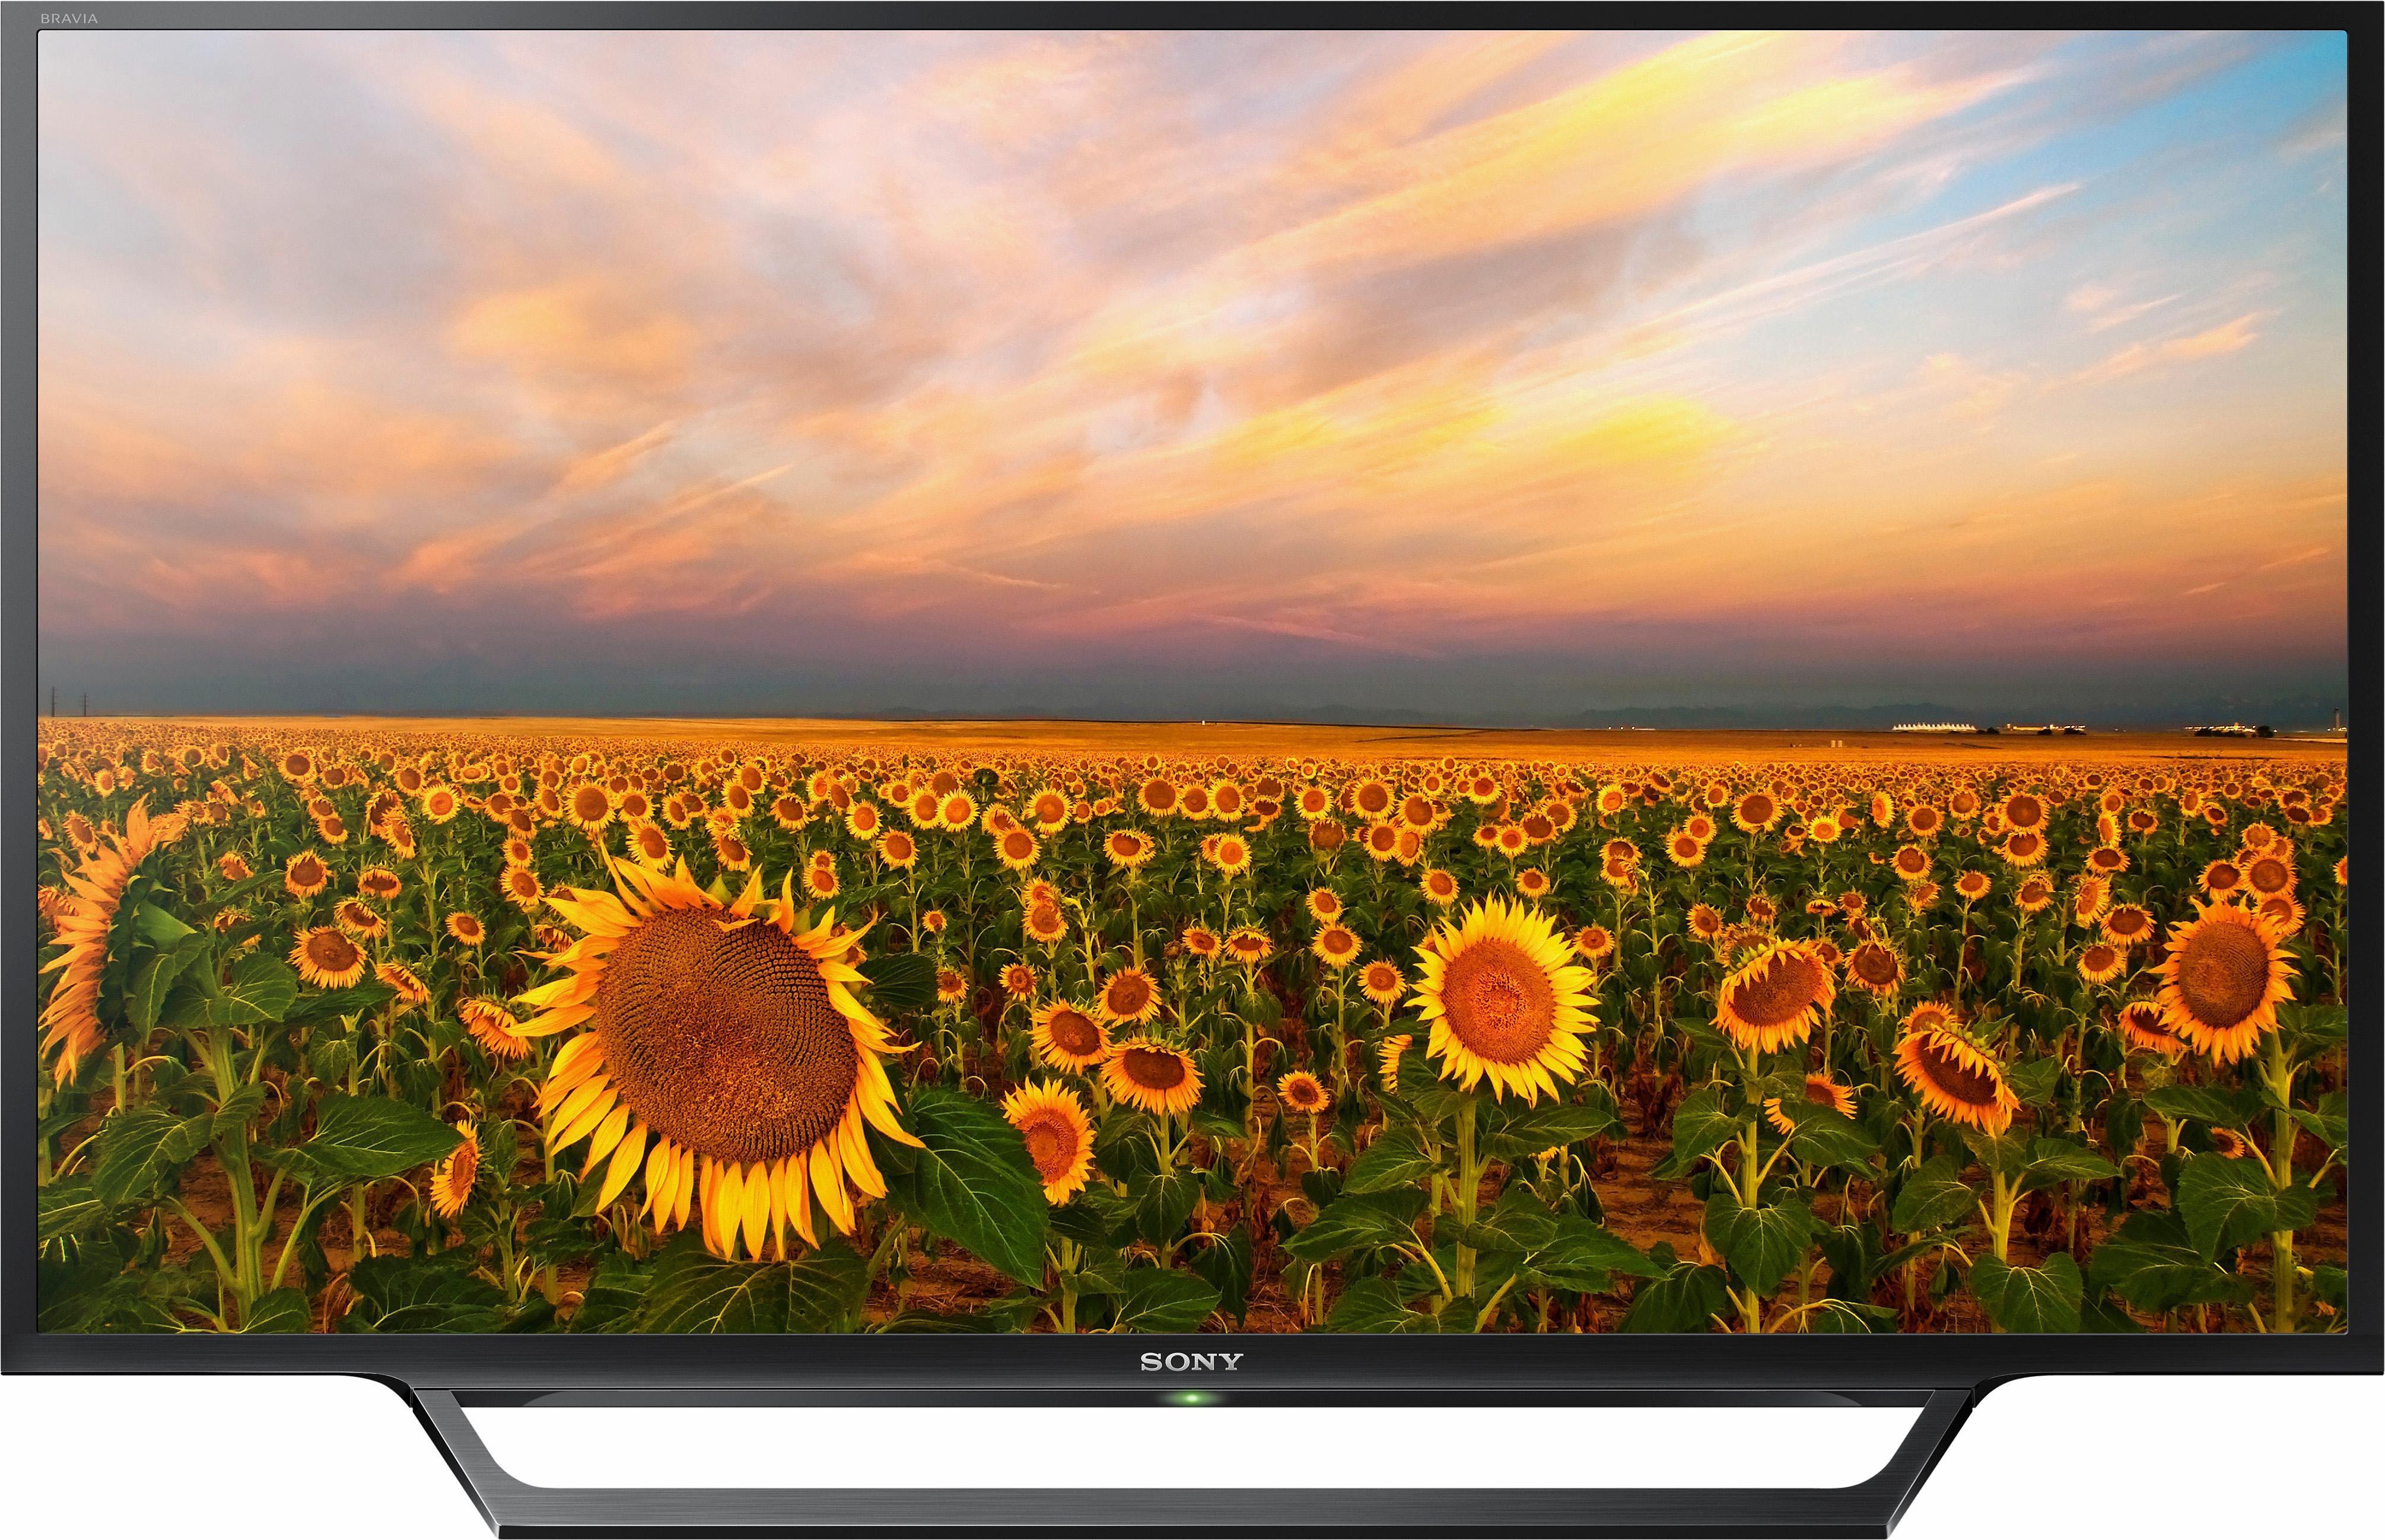 Sony BRAVIA KDL-32RD435, LED Fernseher, 80 cm (32 Zoll), HD-ready 720p